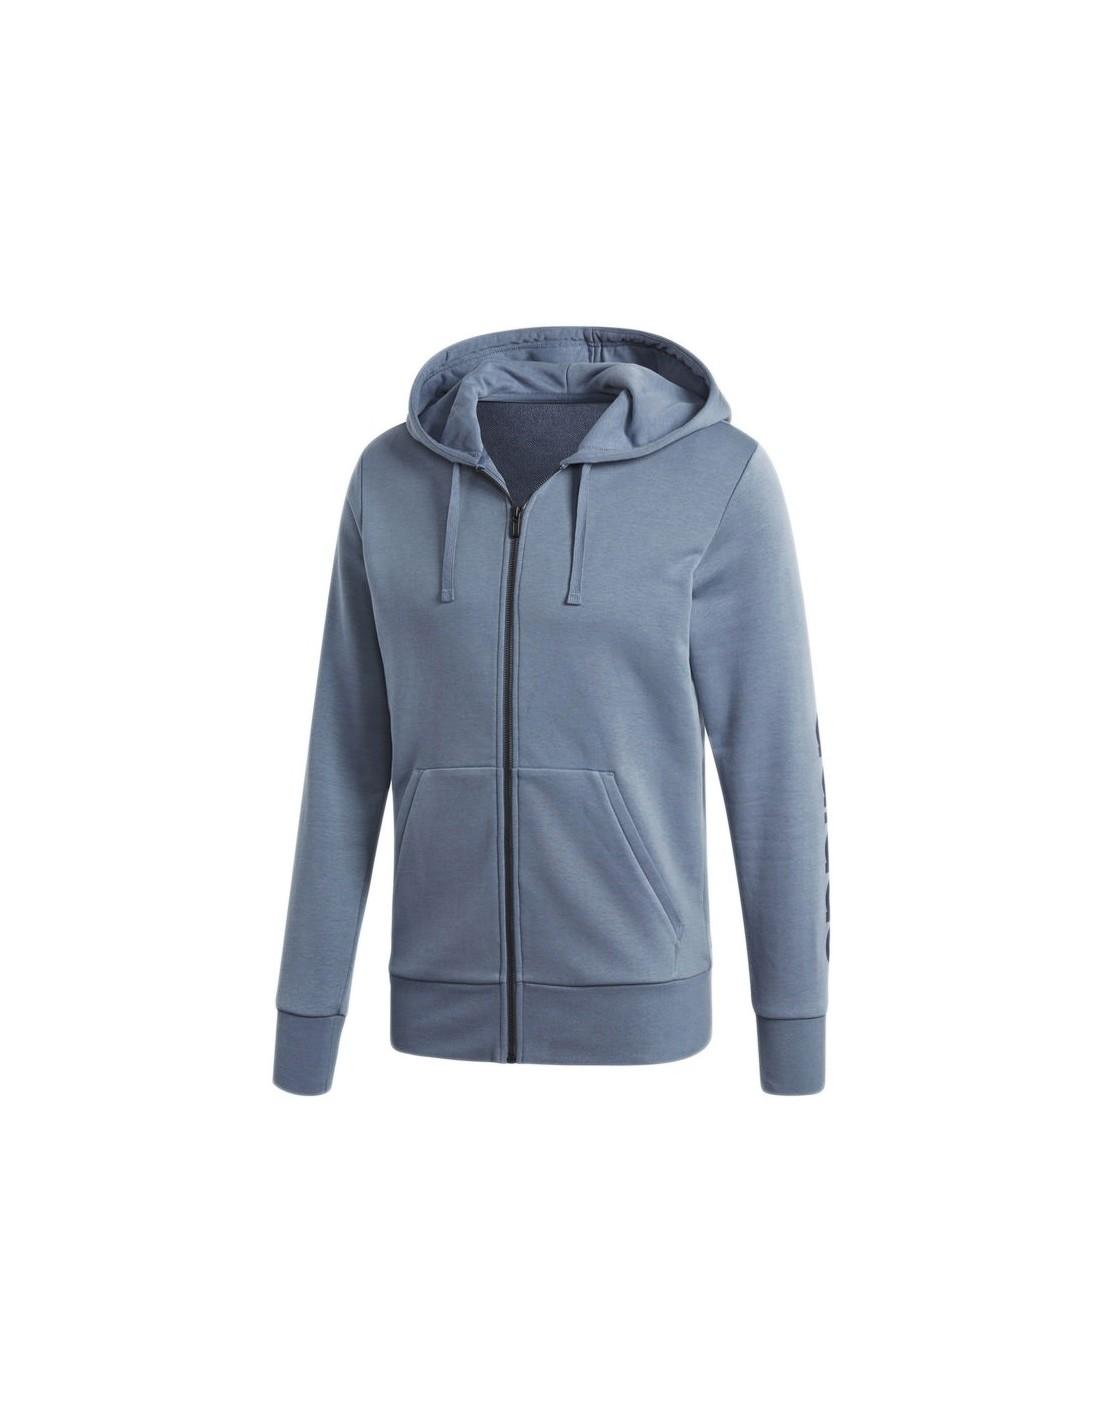 17dce0041315f Felpa Adidas con cappuccio Essentials Linear